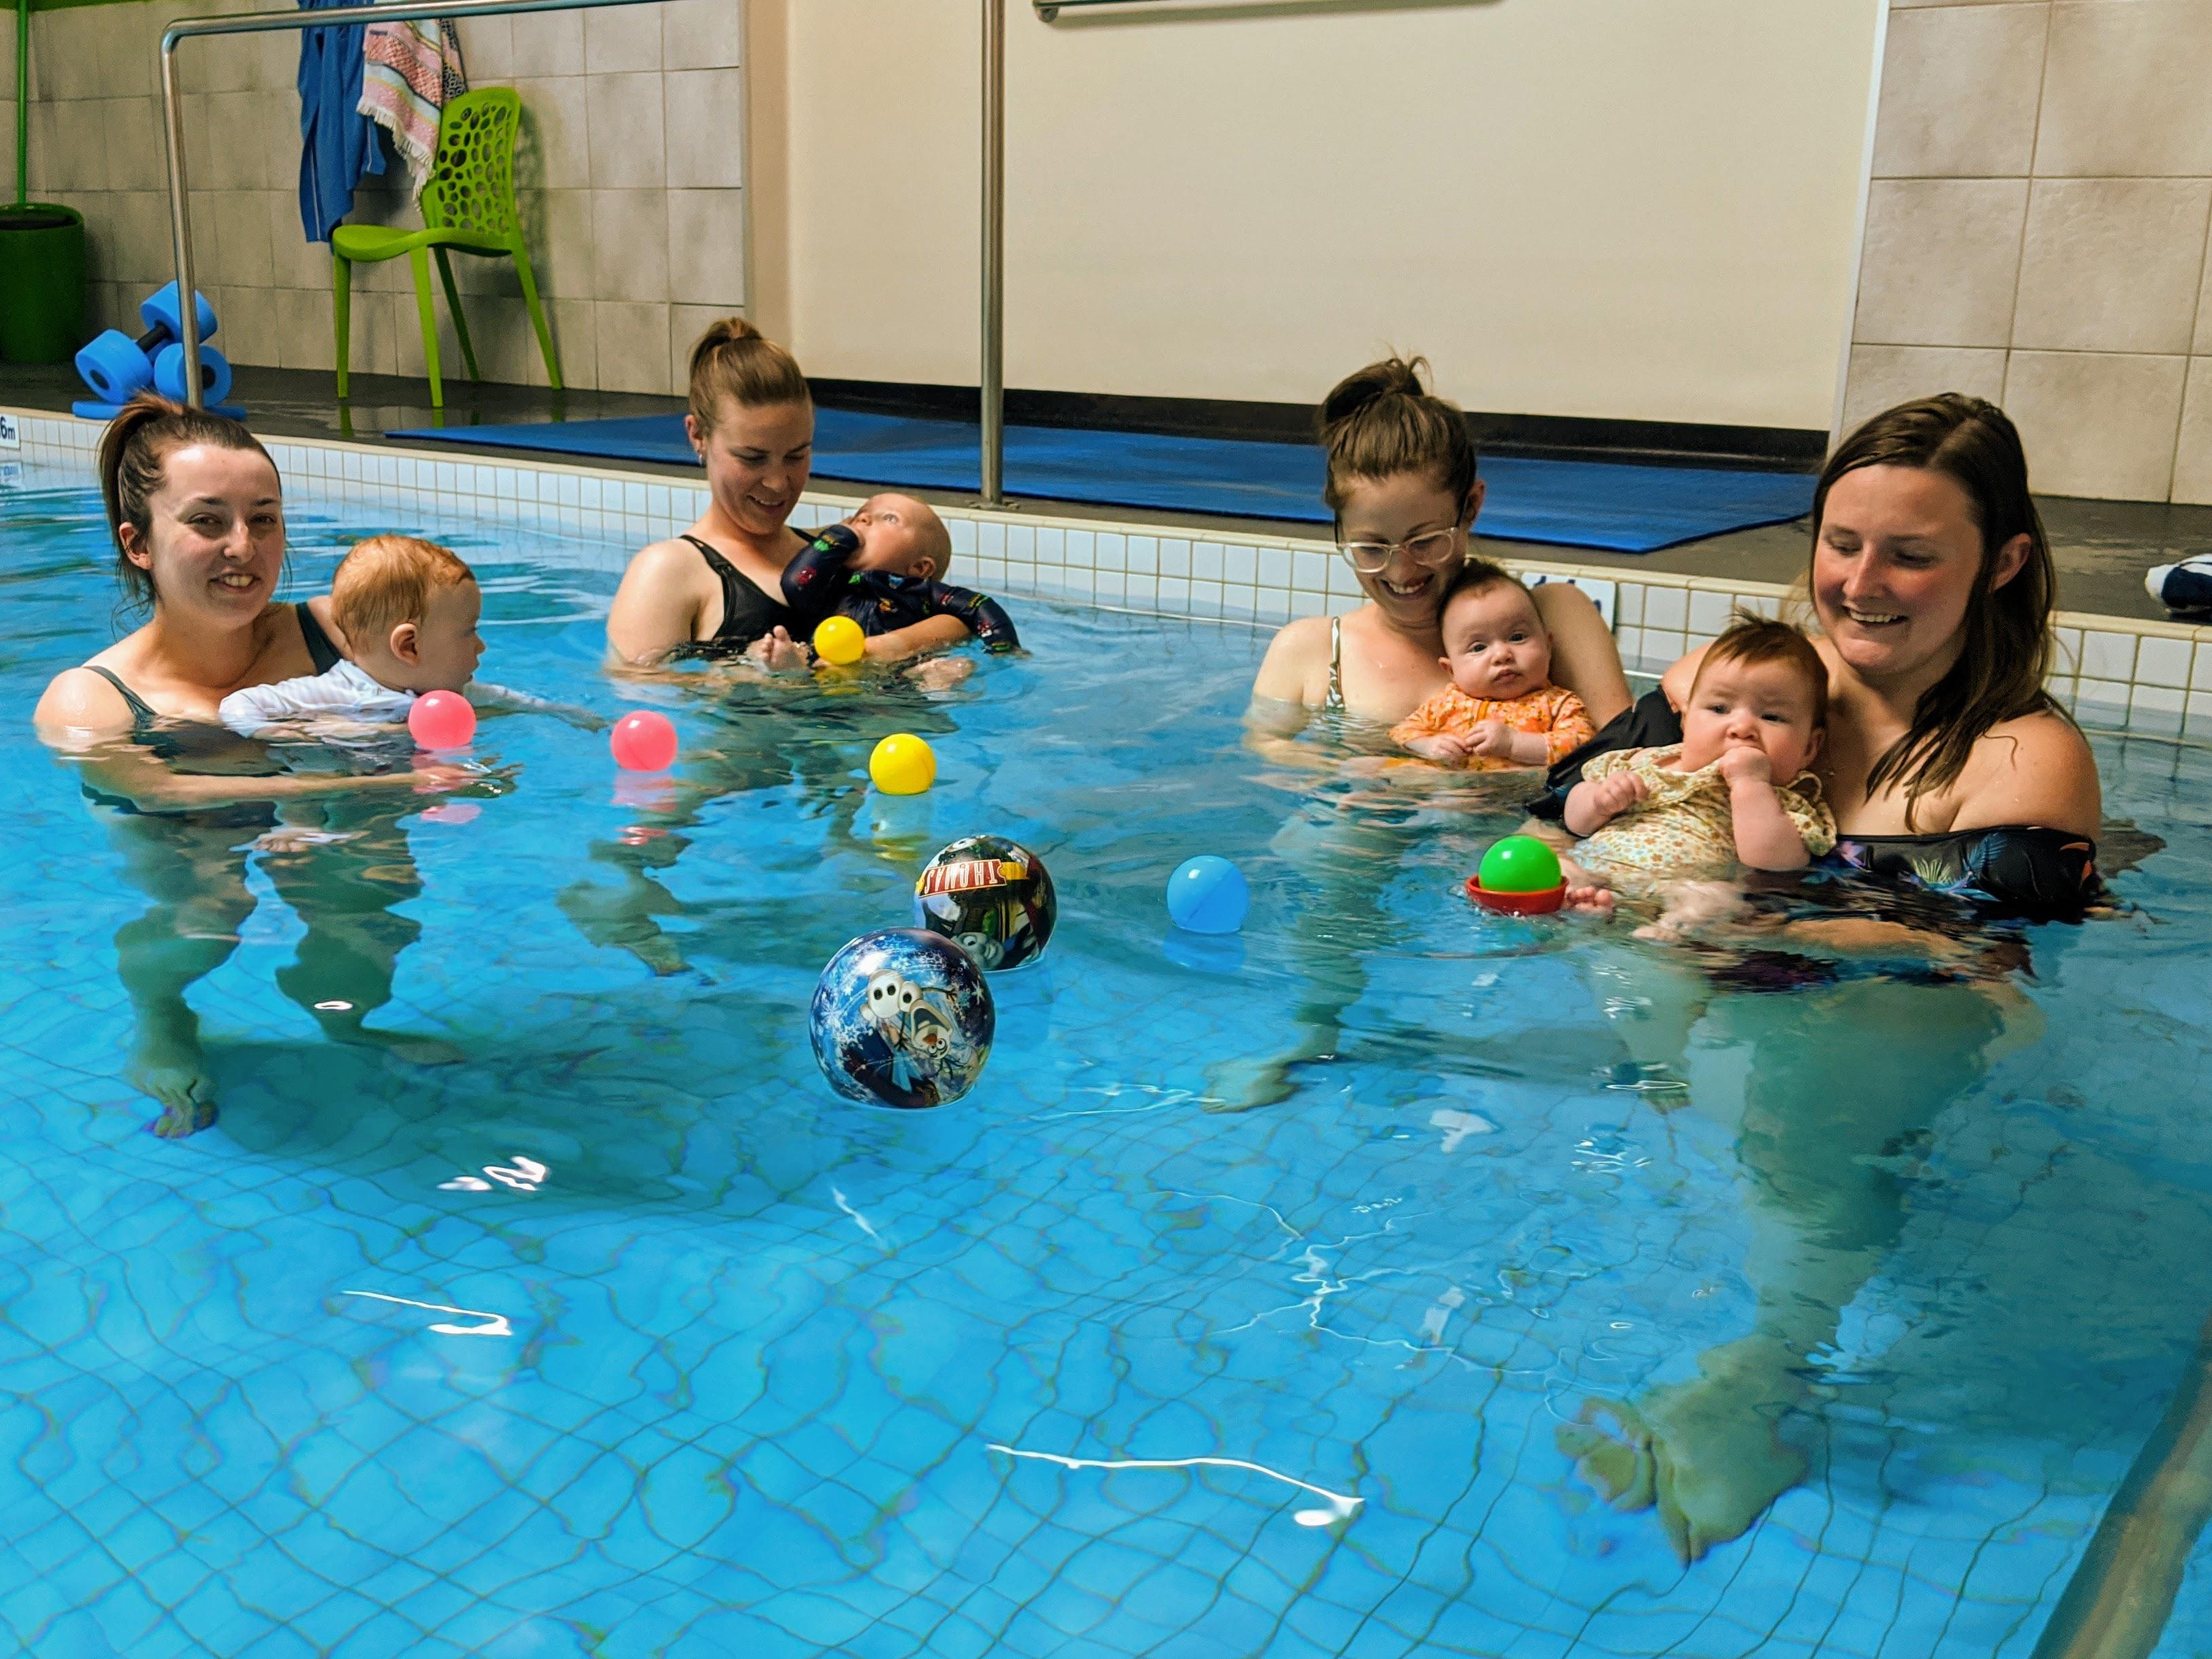 Children in pool.jpg